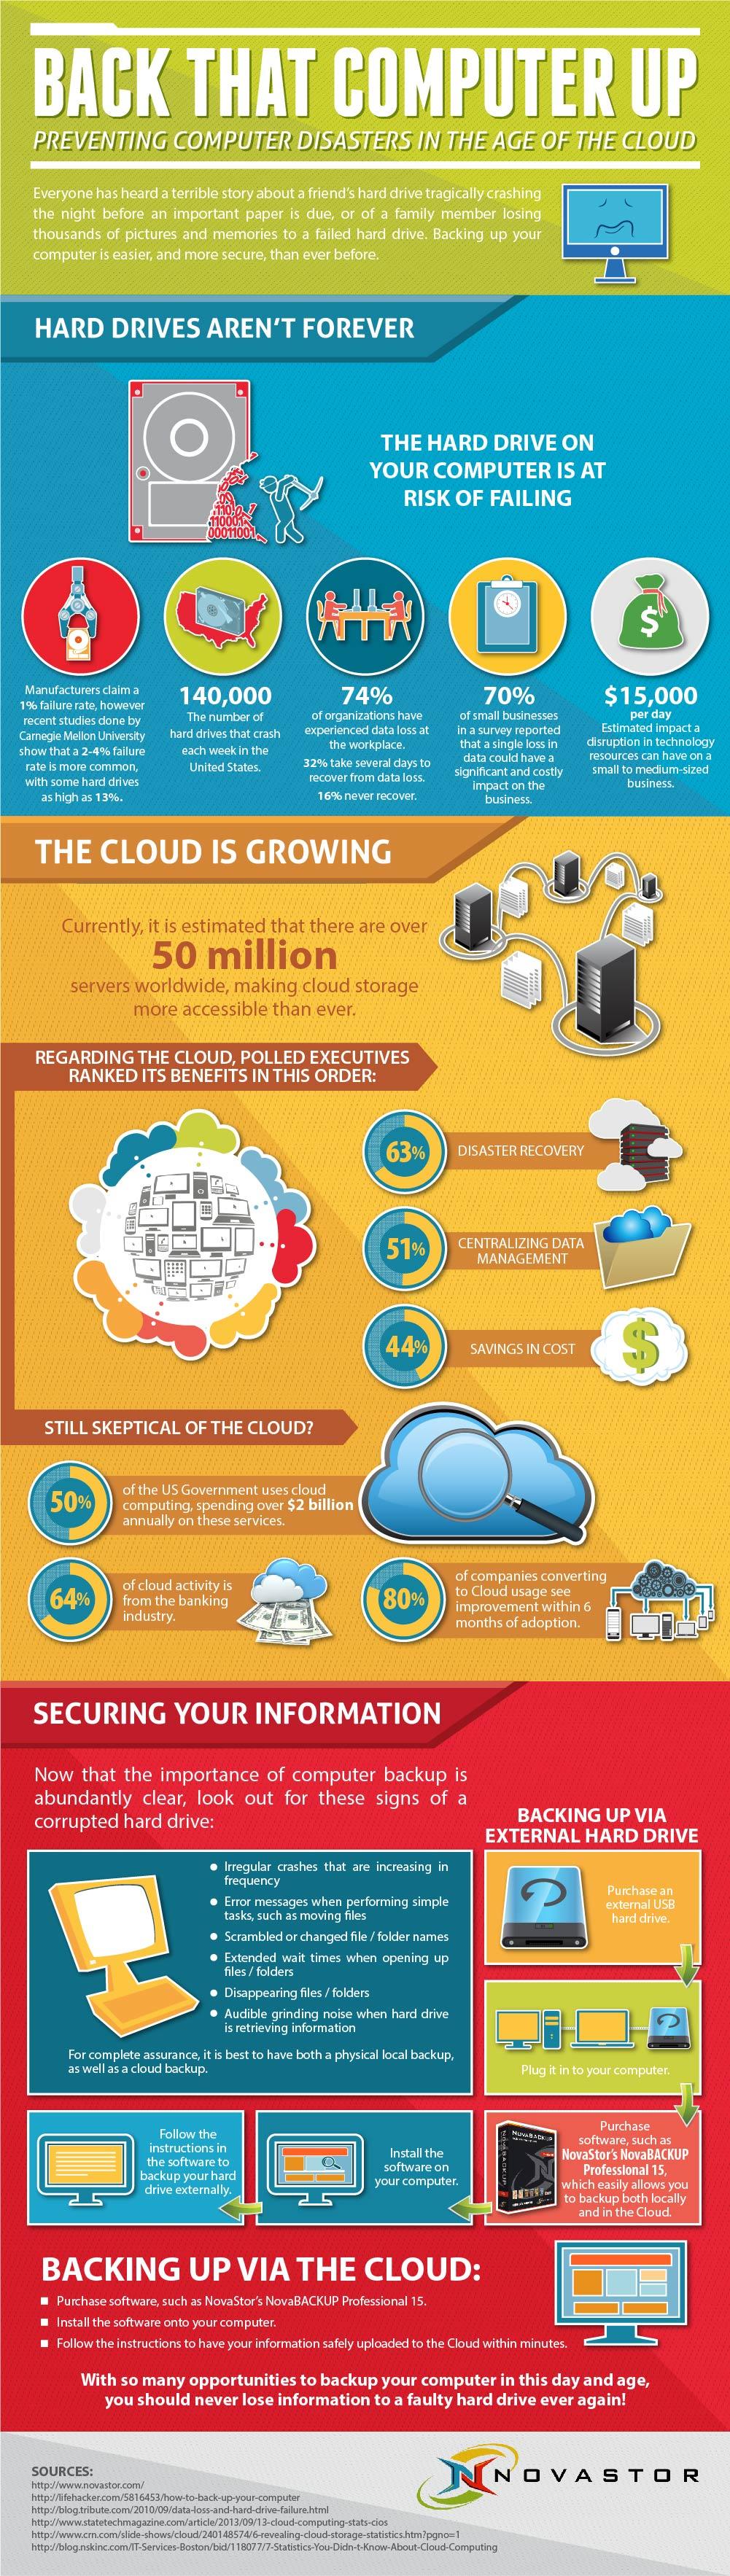 Backingup-cloud